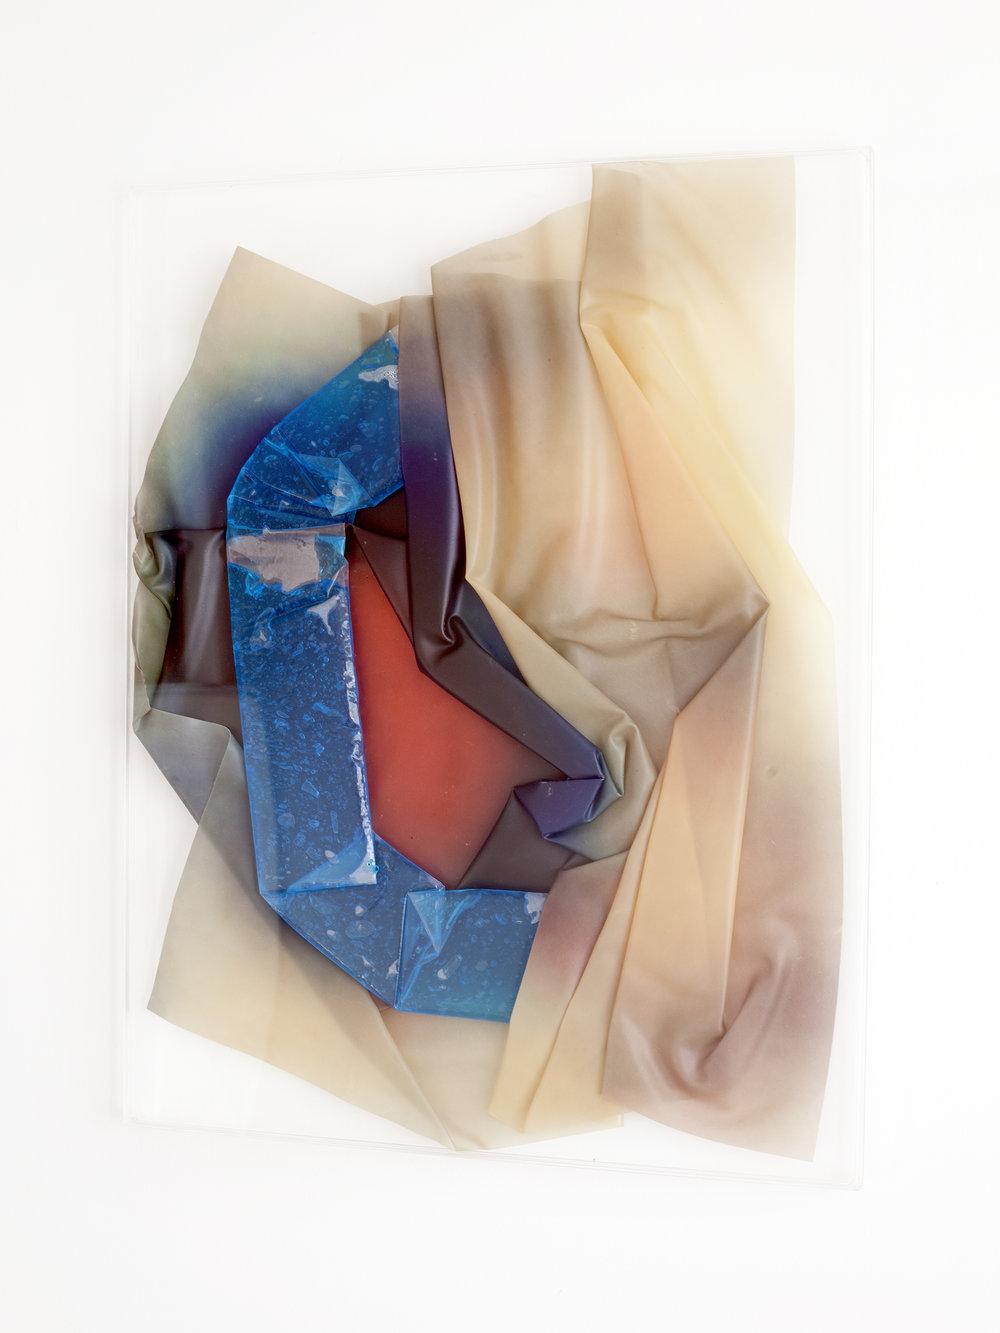 REFUSS, 2018, sculpture (unique), 70 X 55 X 1,6 cm, inkjetprint on latex, transparent acrylic, gel in plastic